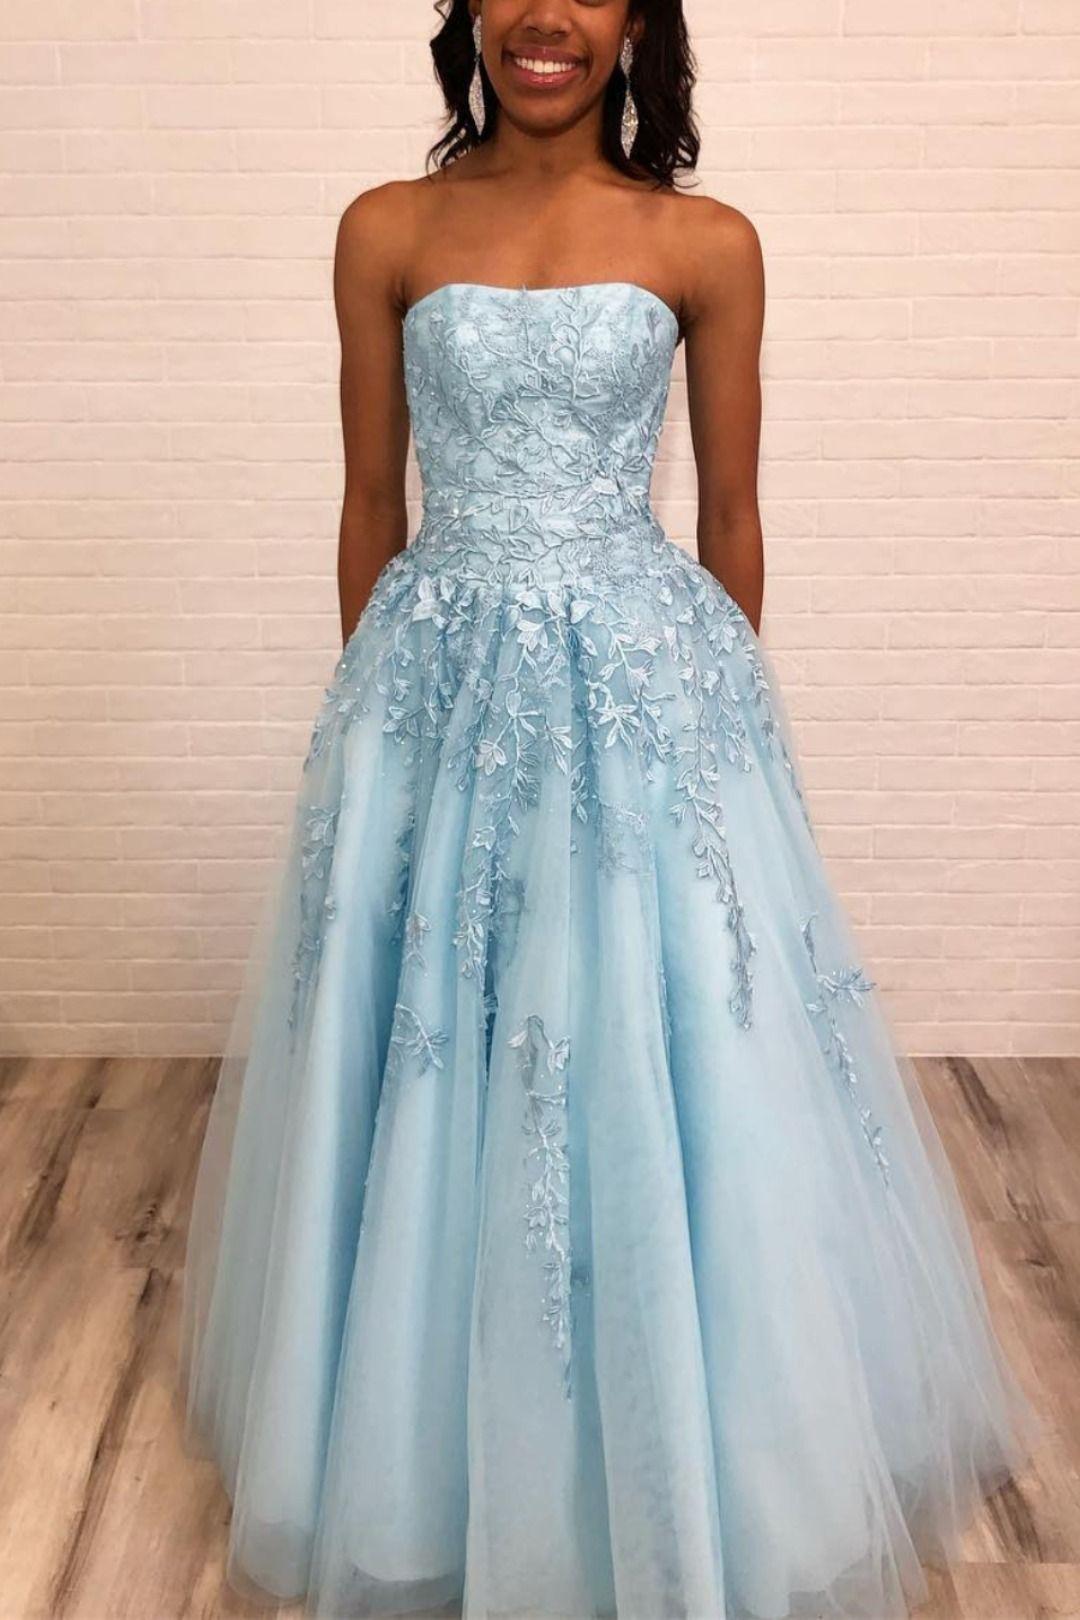 Elegant Strapless Light Sky Blue Long Prom Dress From Wendyhouse Strapless Prom Dresses Prom Dresses Lace Lace Formal Dress [ 1620 x 1080 Pixel ]